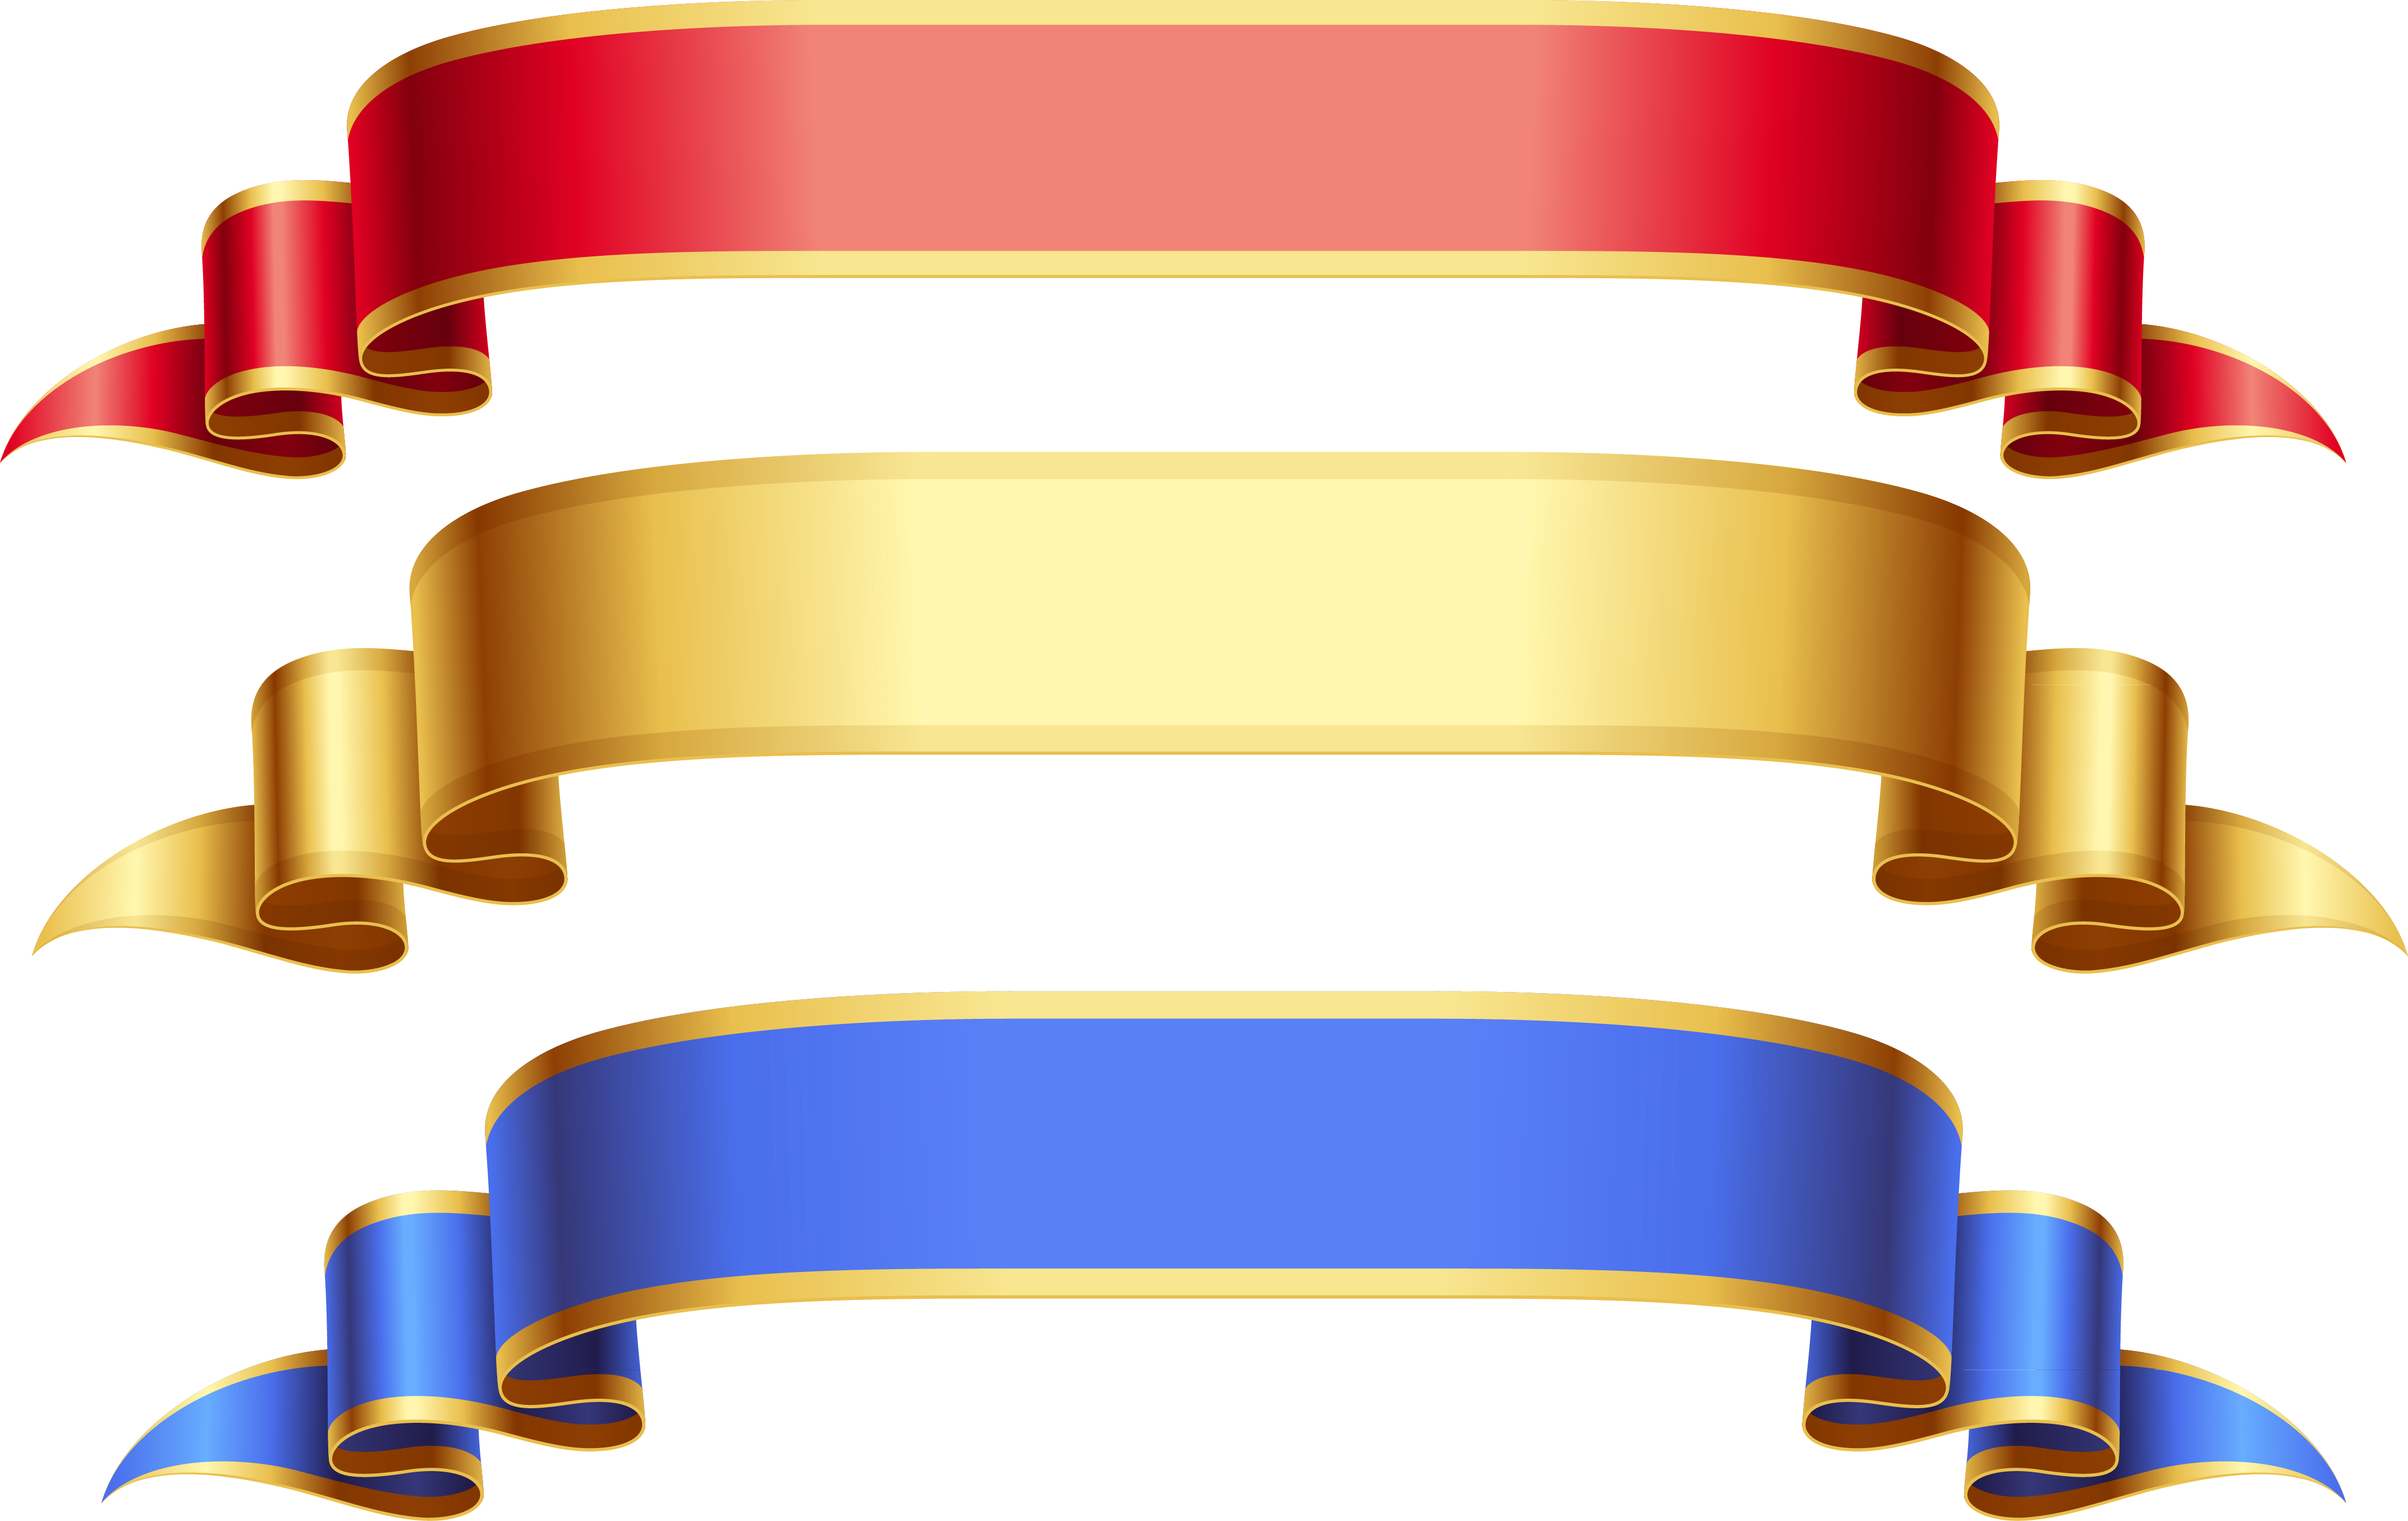 4291x2711 Ribbon Banner Png